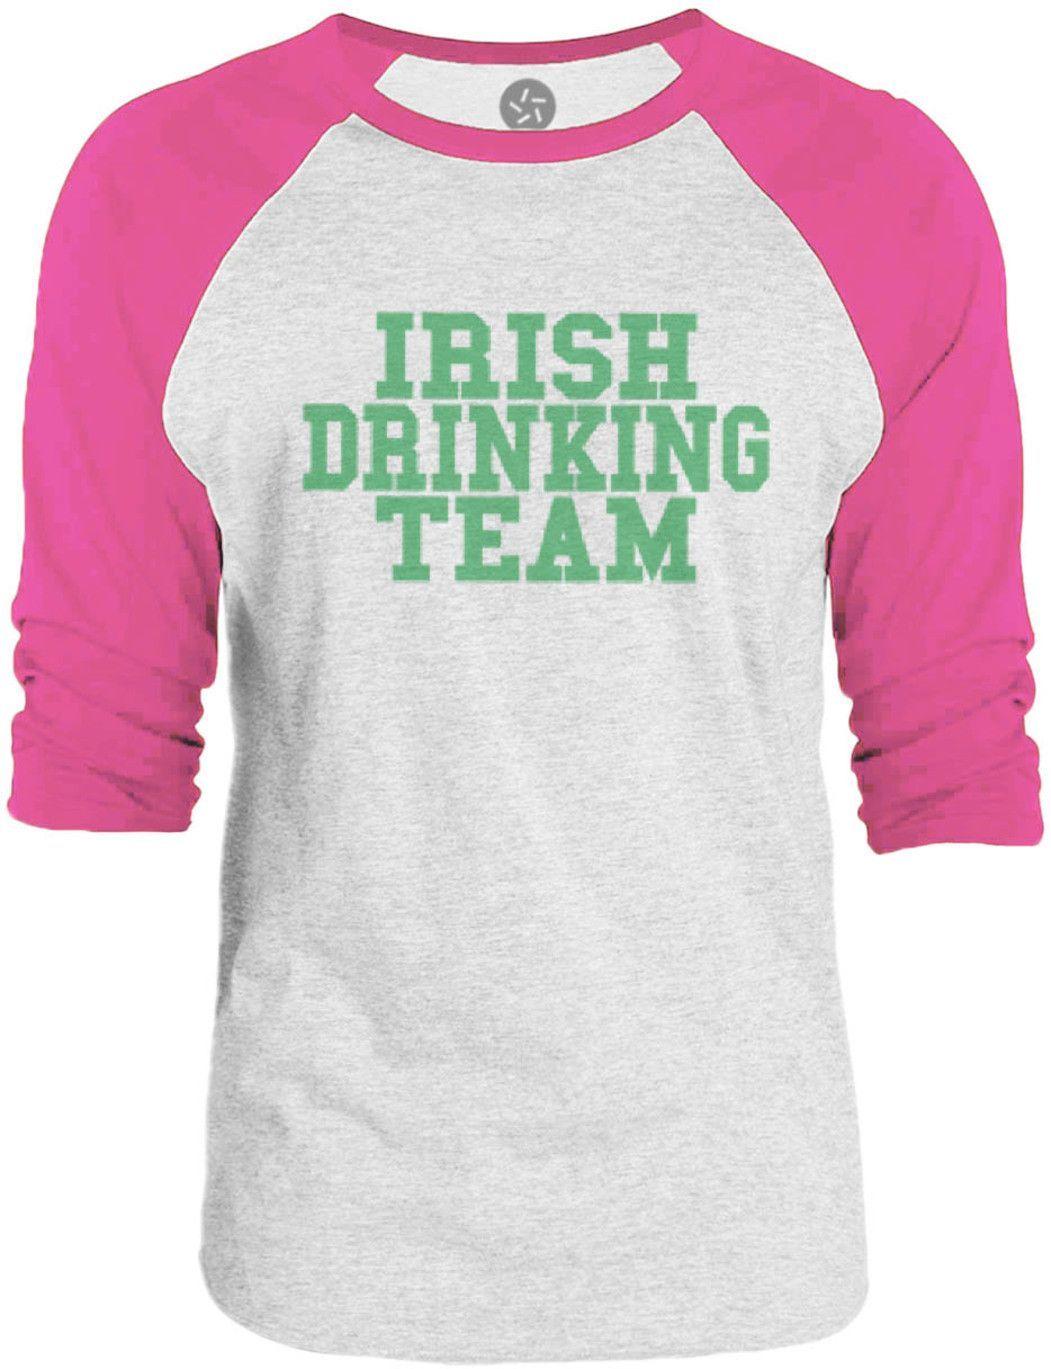 Big Texas Irish Drinking Team (Green) 3/4-Sleeve Raglan Baseball T-Shirt